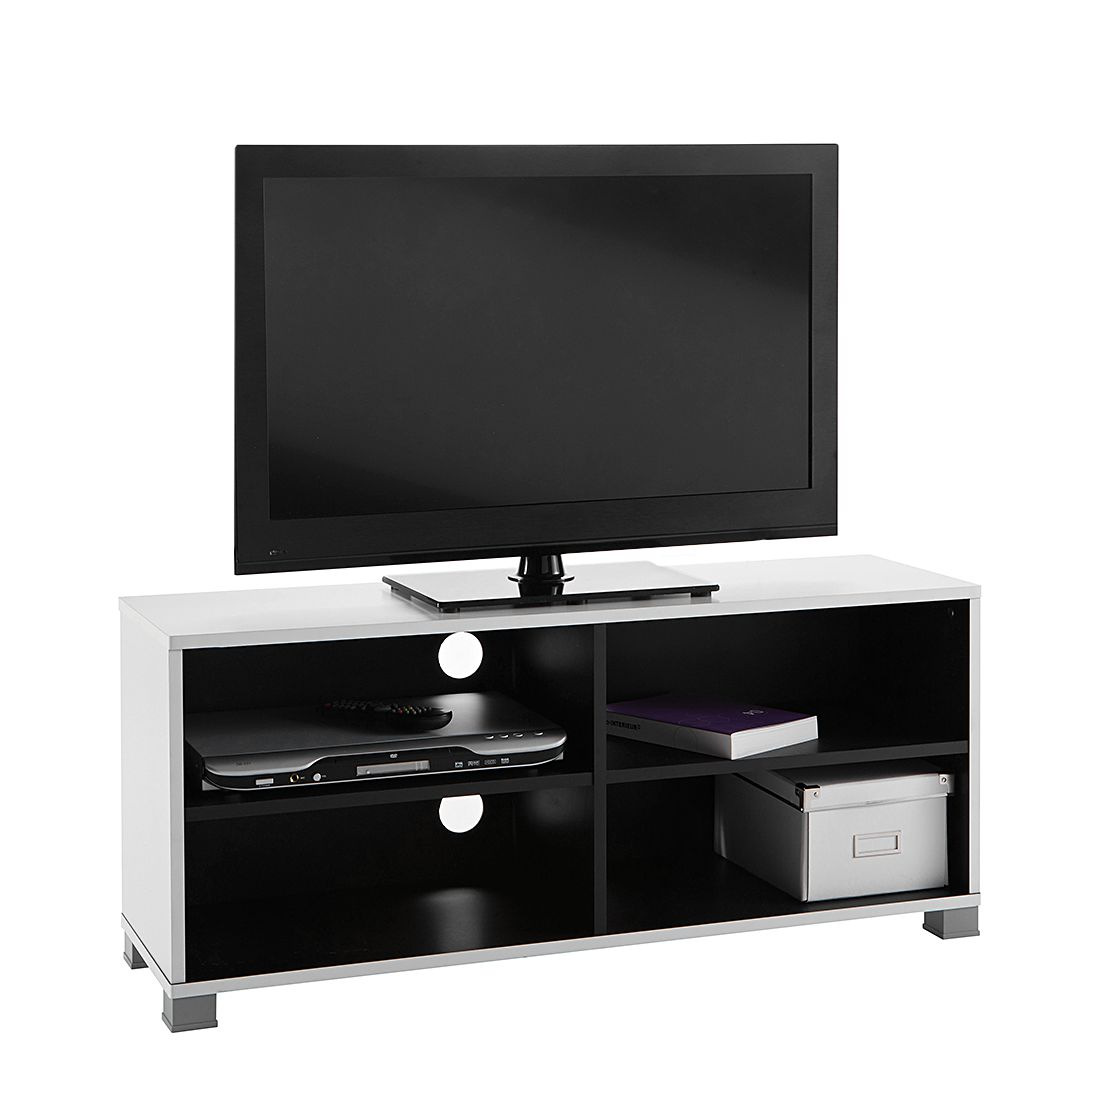 scrapeo meuble tv noir blanc. Black Bedroom Furniture Sets. Home Design Ideas